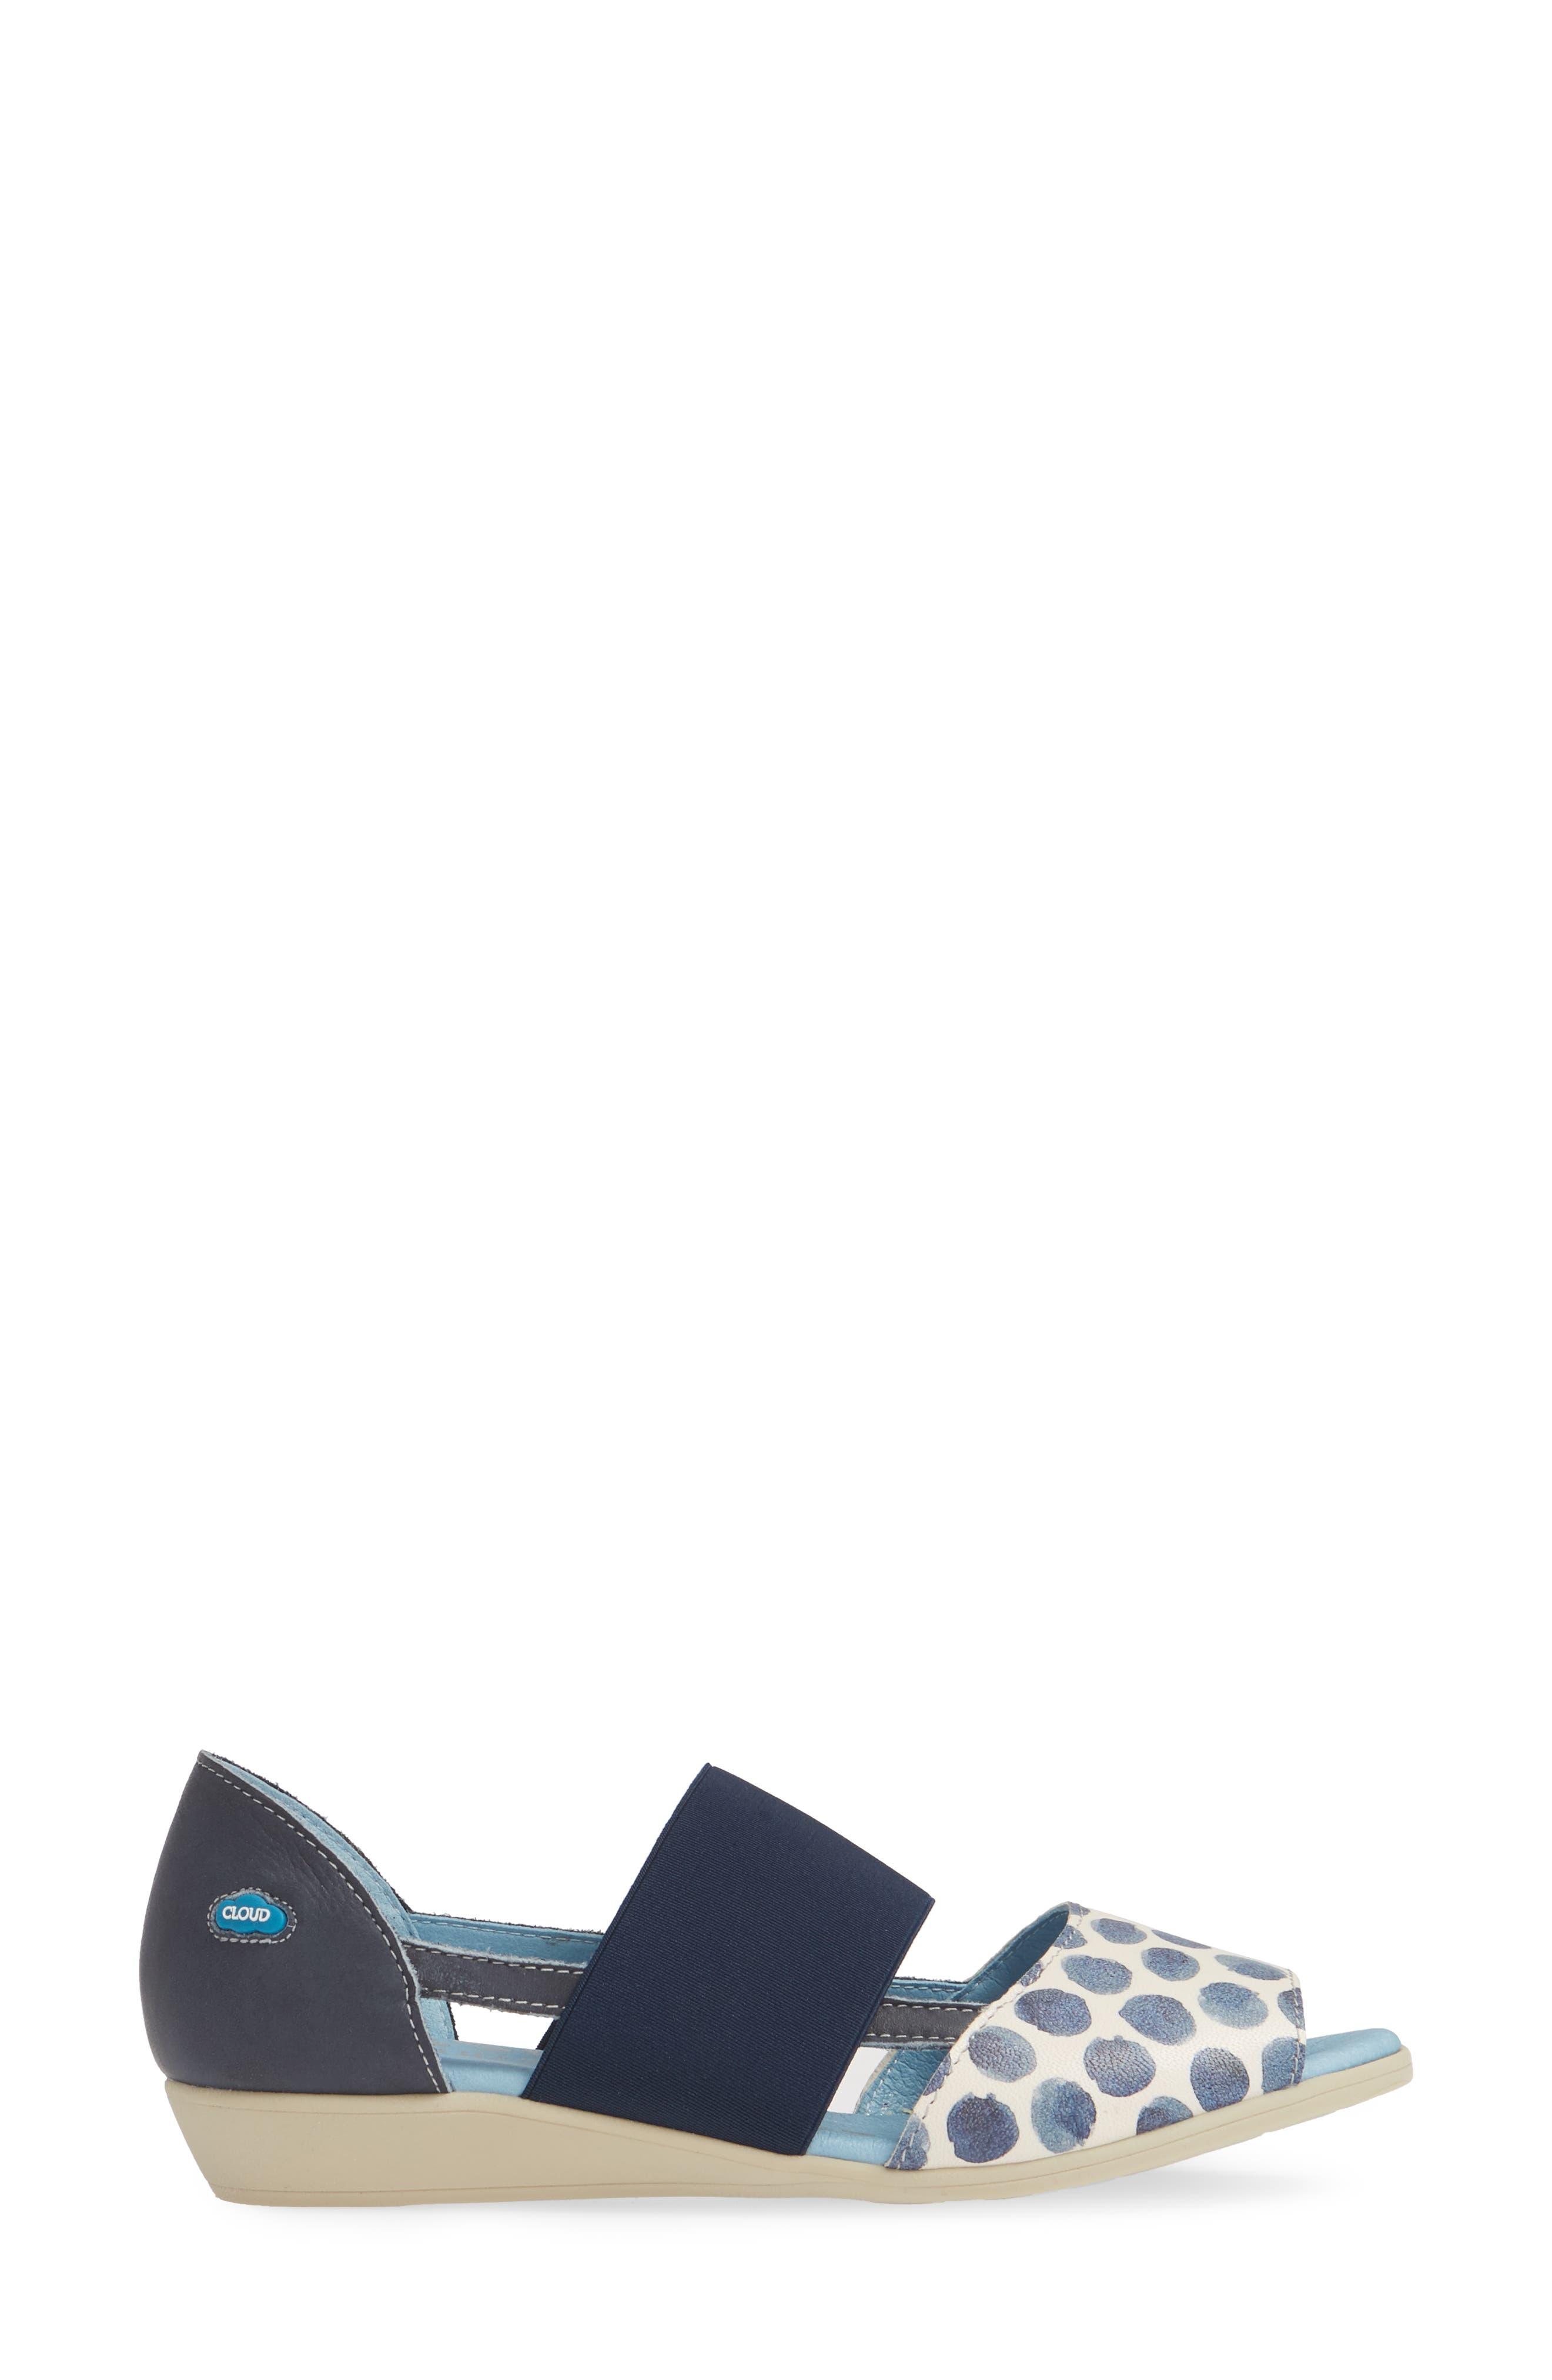 CLOUD,                             'Canary' Skimmer Sandal,                             Alternate thumbnail 3, color,                             TUPAI BLUE LEATHER